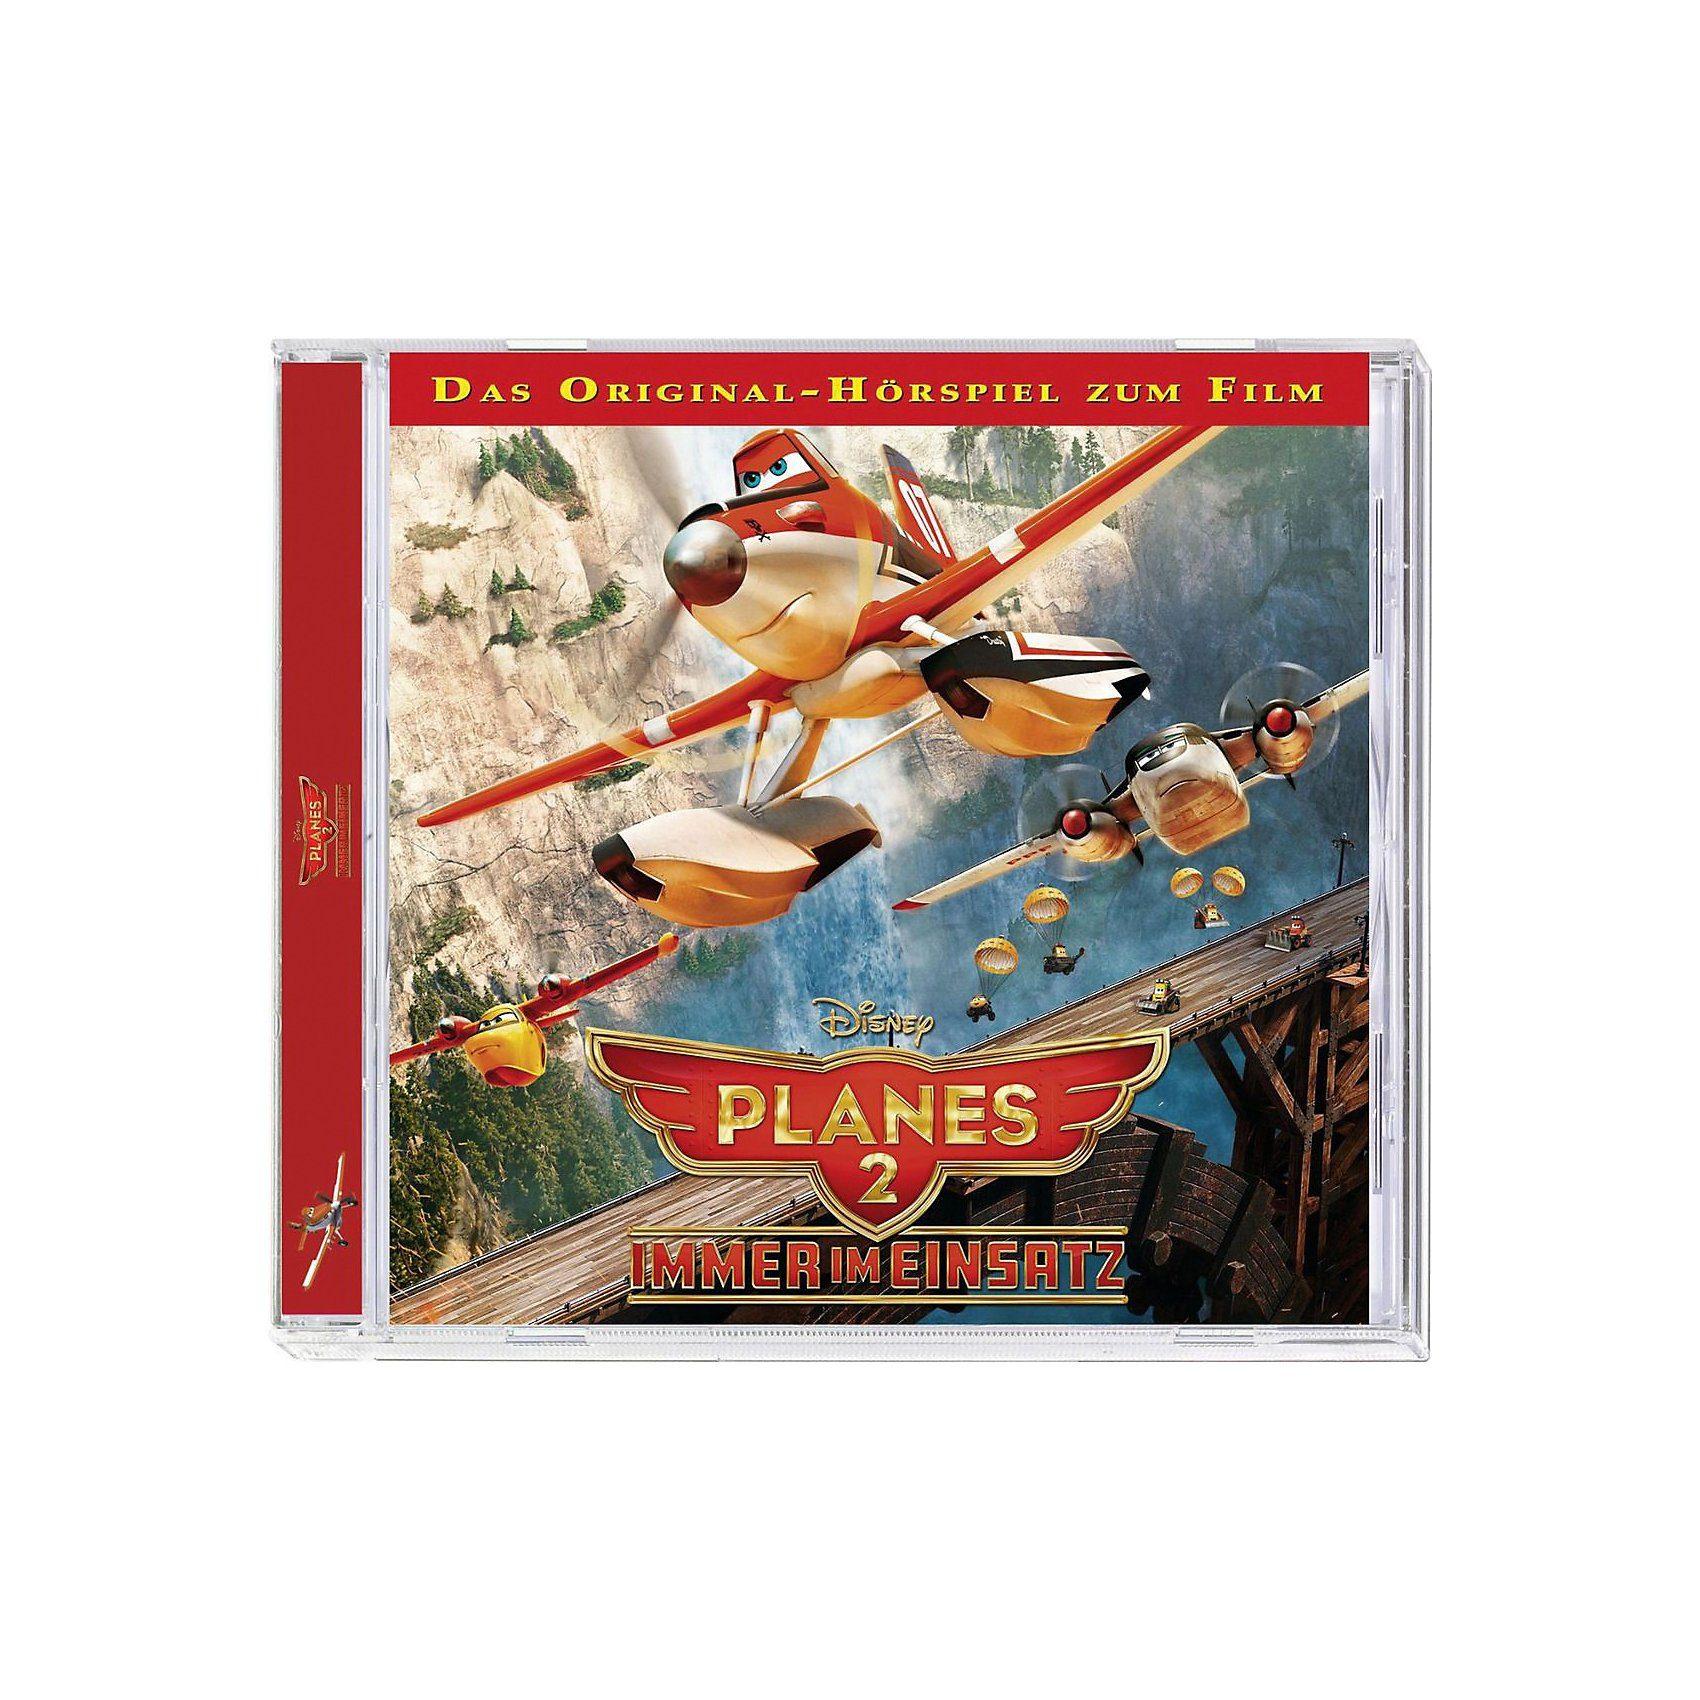 Kiddinx CD Disney Planes 2